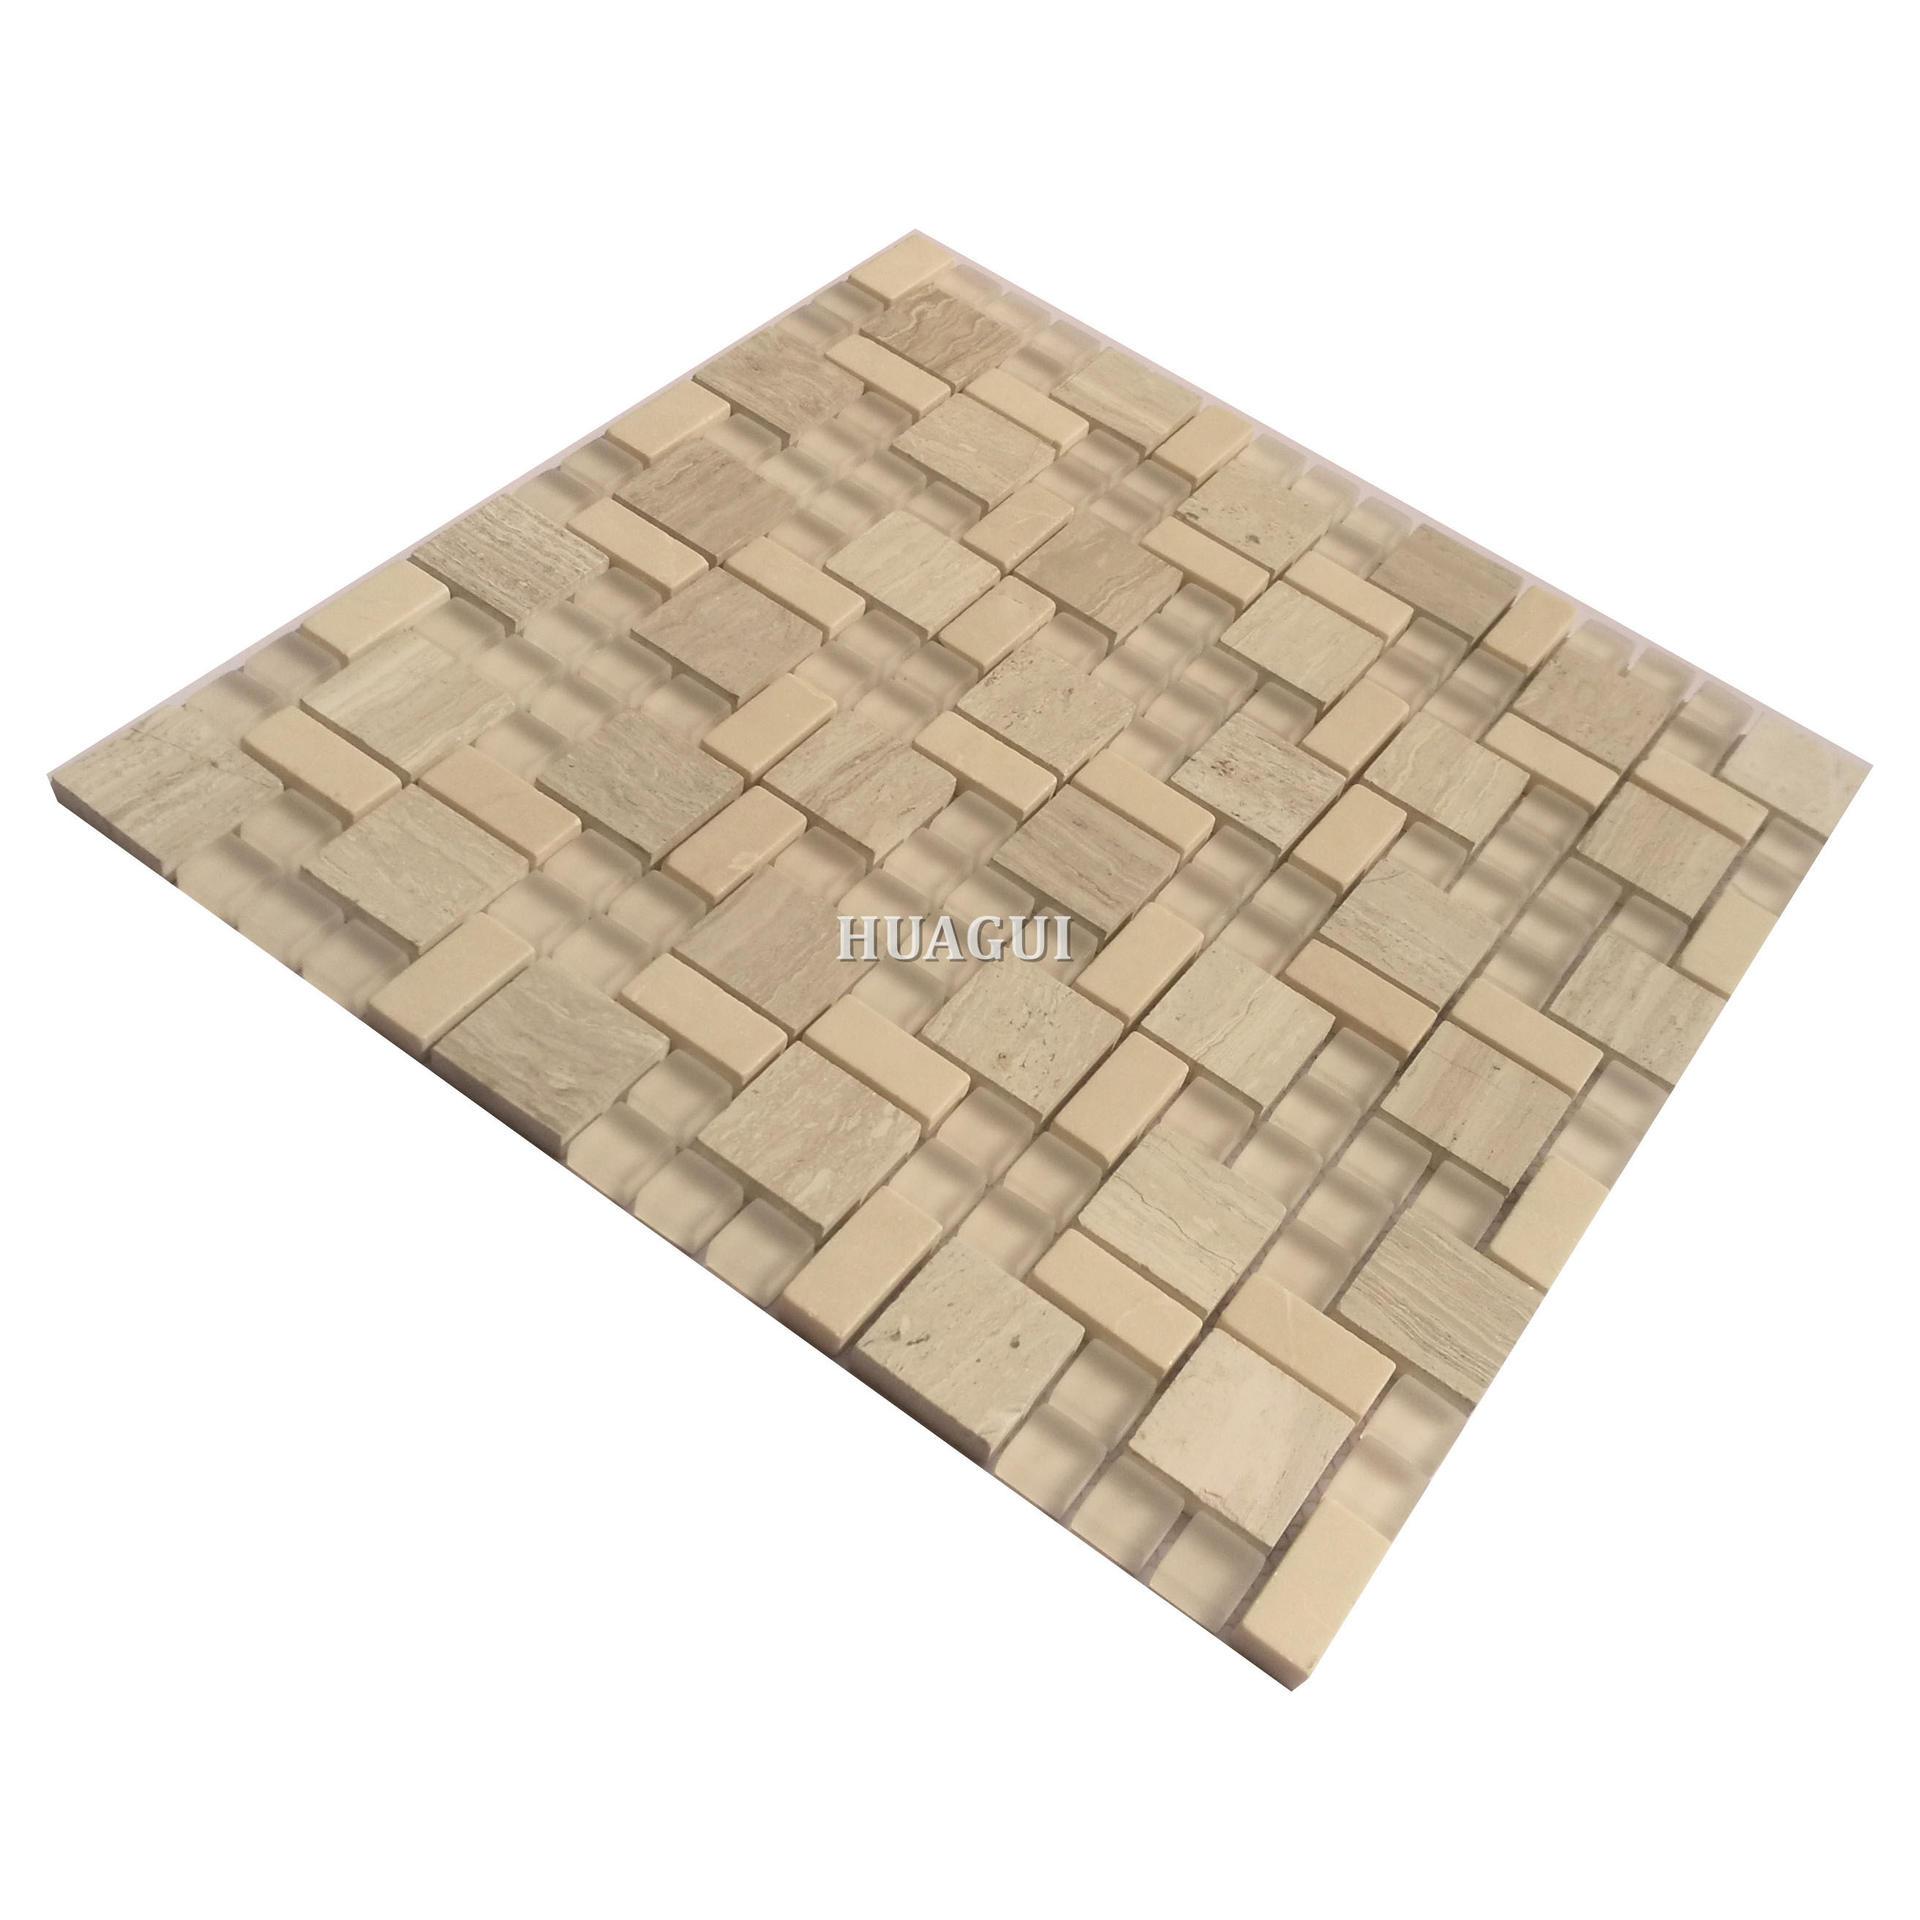 High-quality Moroccan glass stone backsplash kitchen mosaic tile